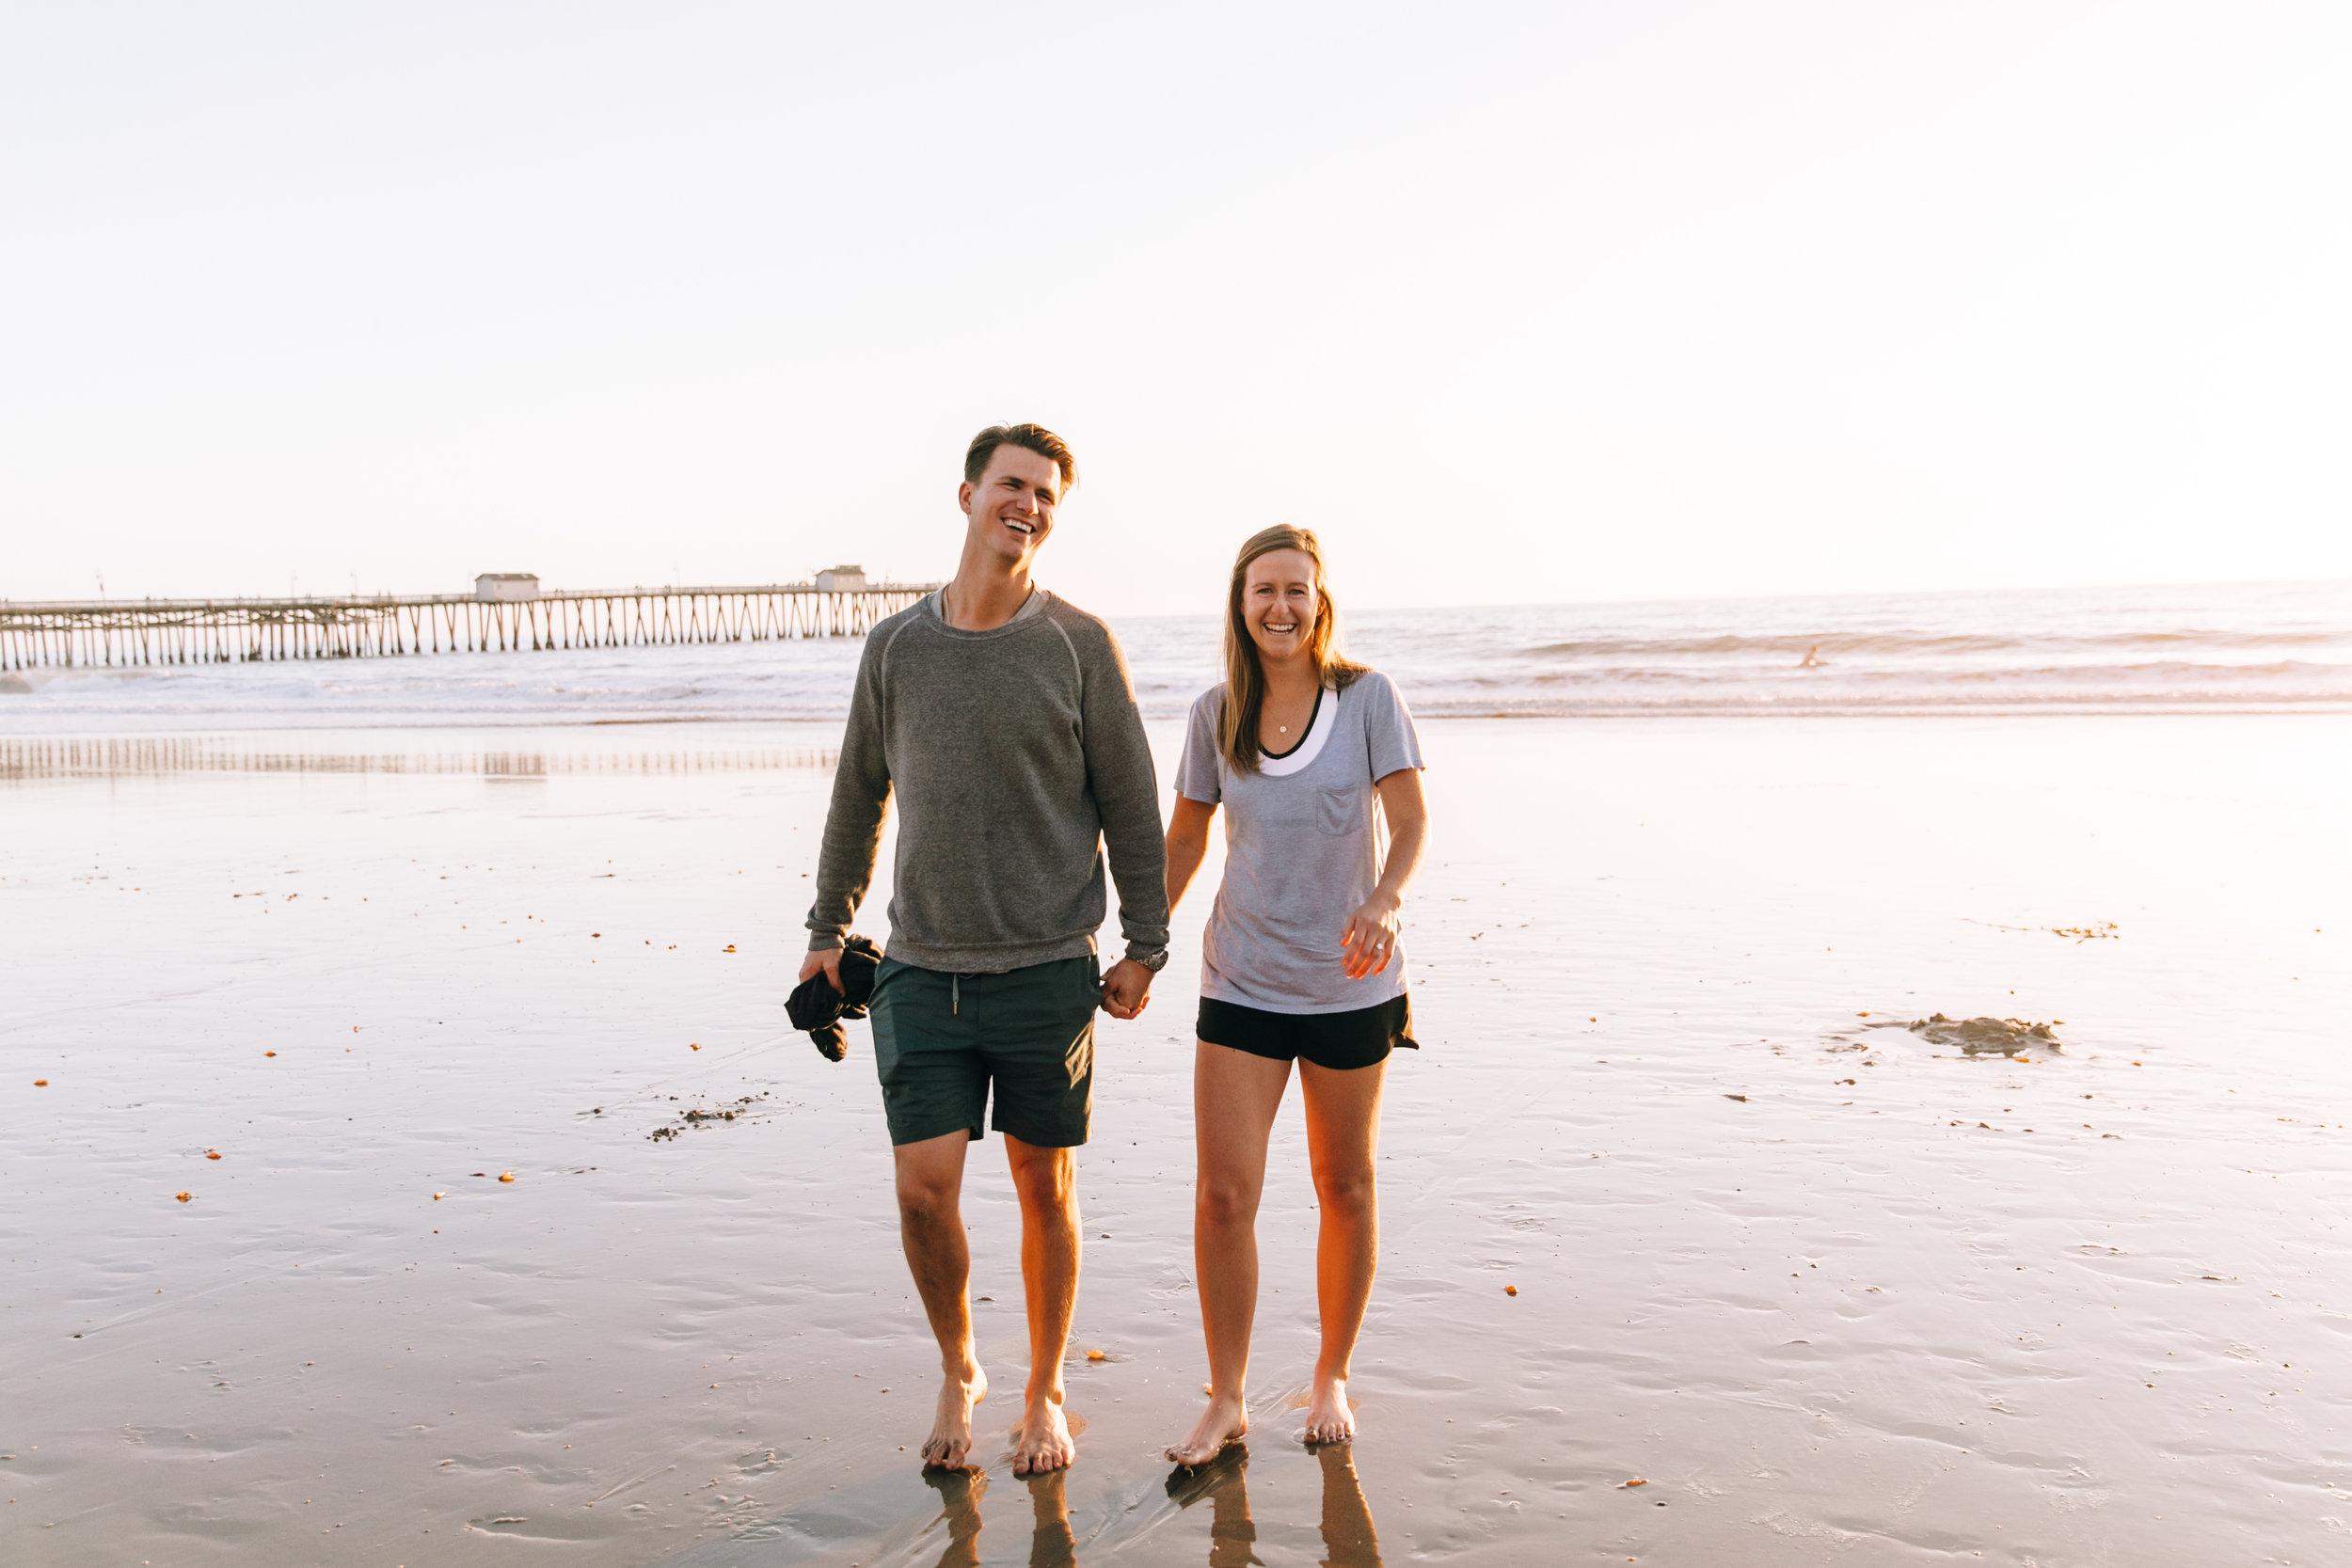 Orange County Photographer, OC Photographer, Orange County Engagement Session, San Clemente Pier Proposal, San Clemente Proposal, OC Proposal Photographer, Southern California Photographer